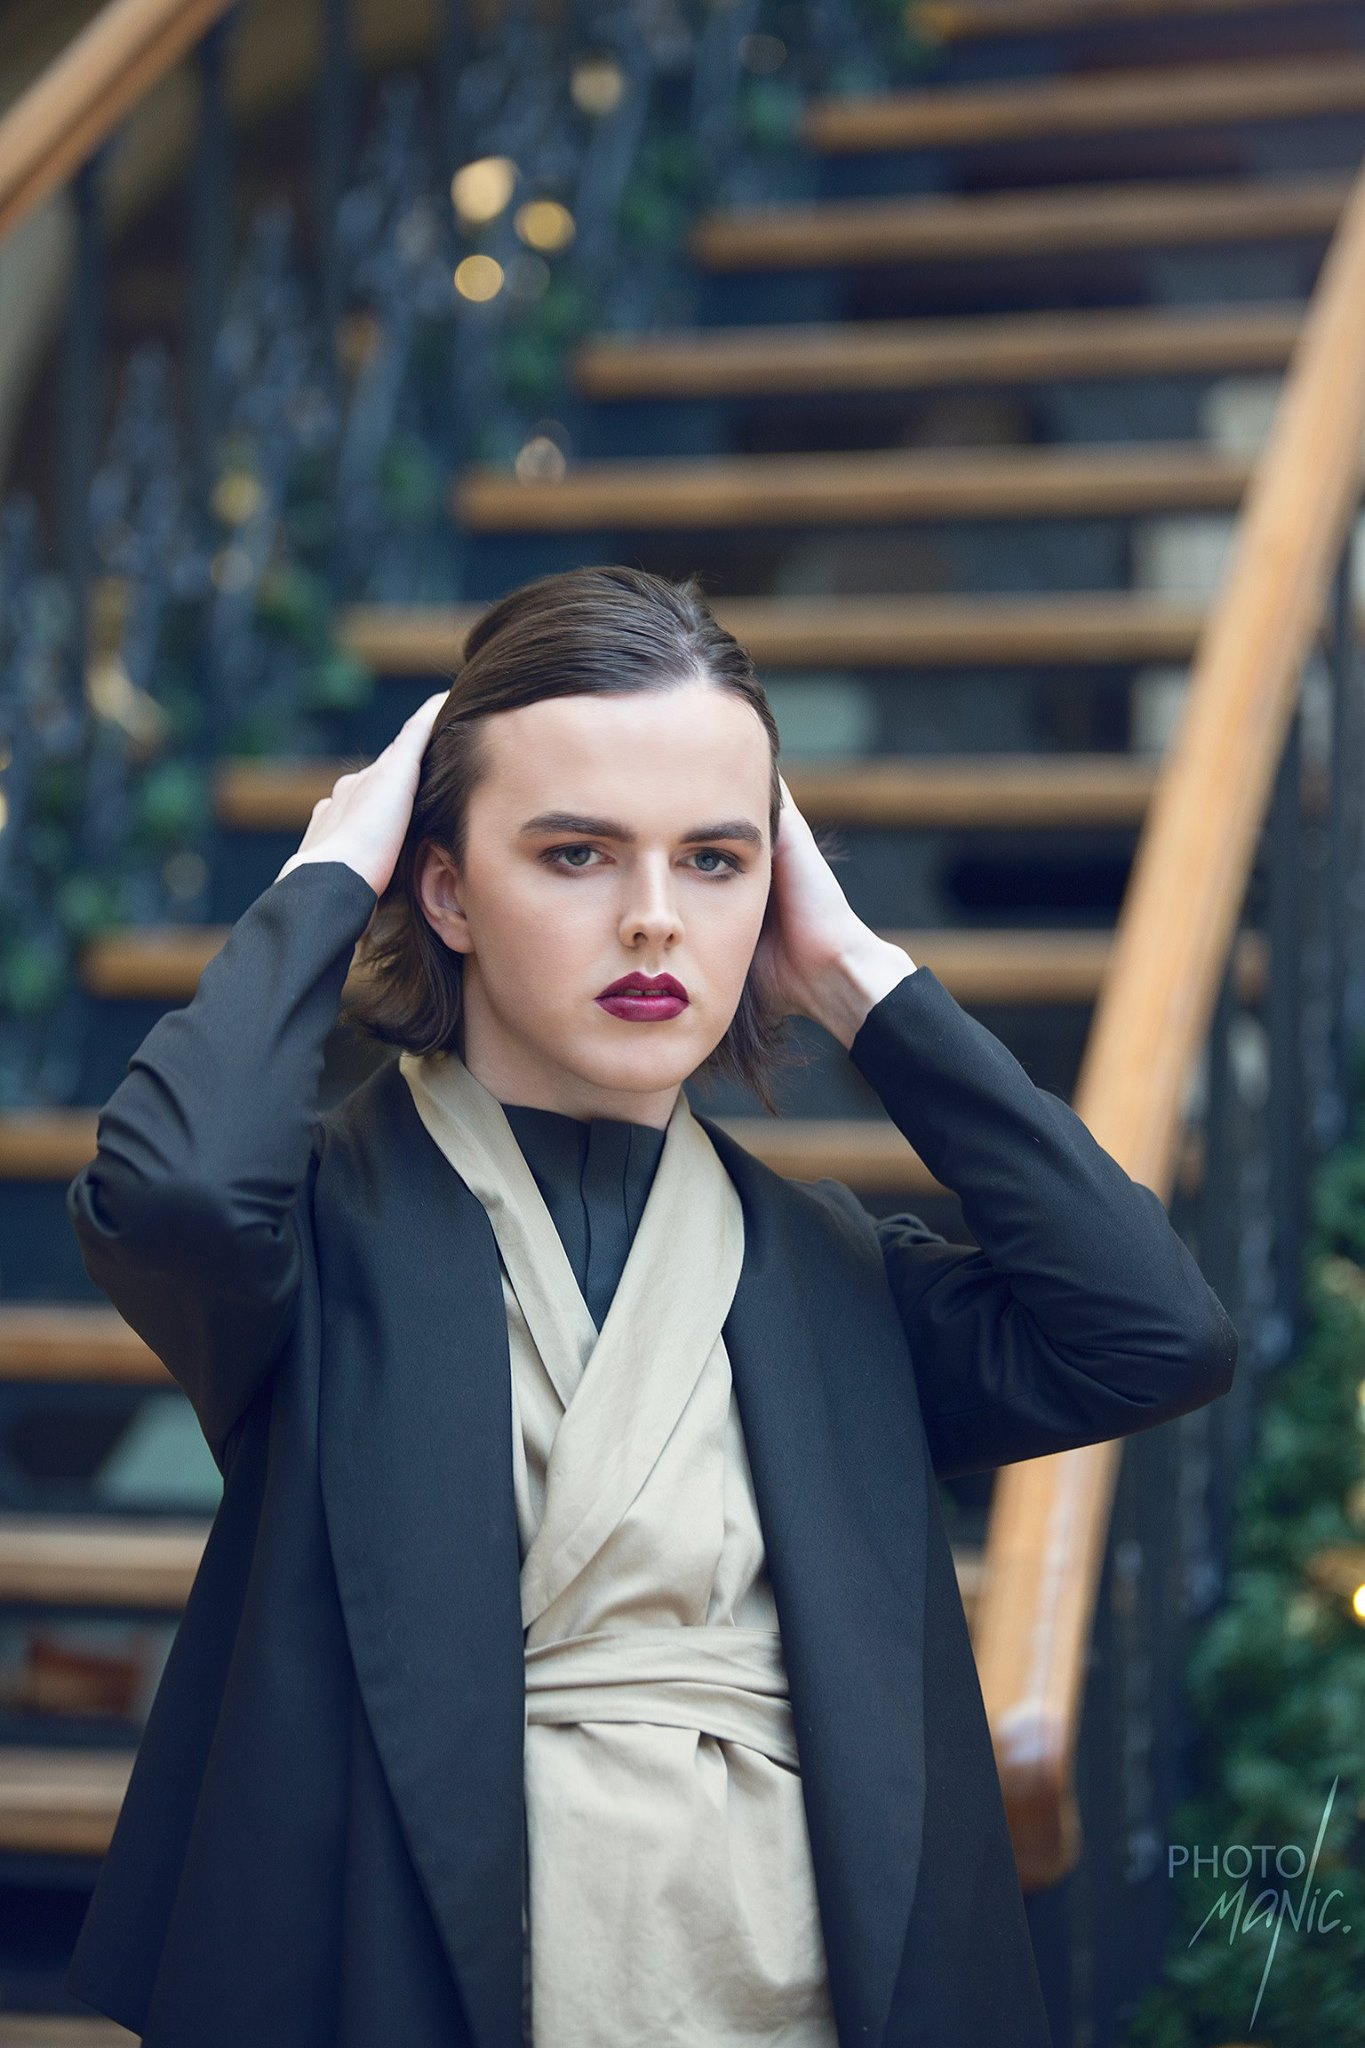 zaramia-ava-zaramiaava-leeds-fashion-designer-ethical-sustainable-black-jacket-drape-red-mai-mioka-shirt-unisex-dress-mio-mioka-jacket-beige-12.jpg